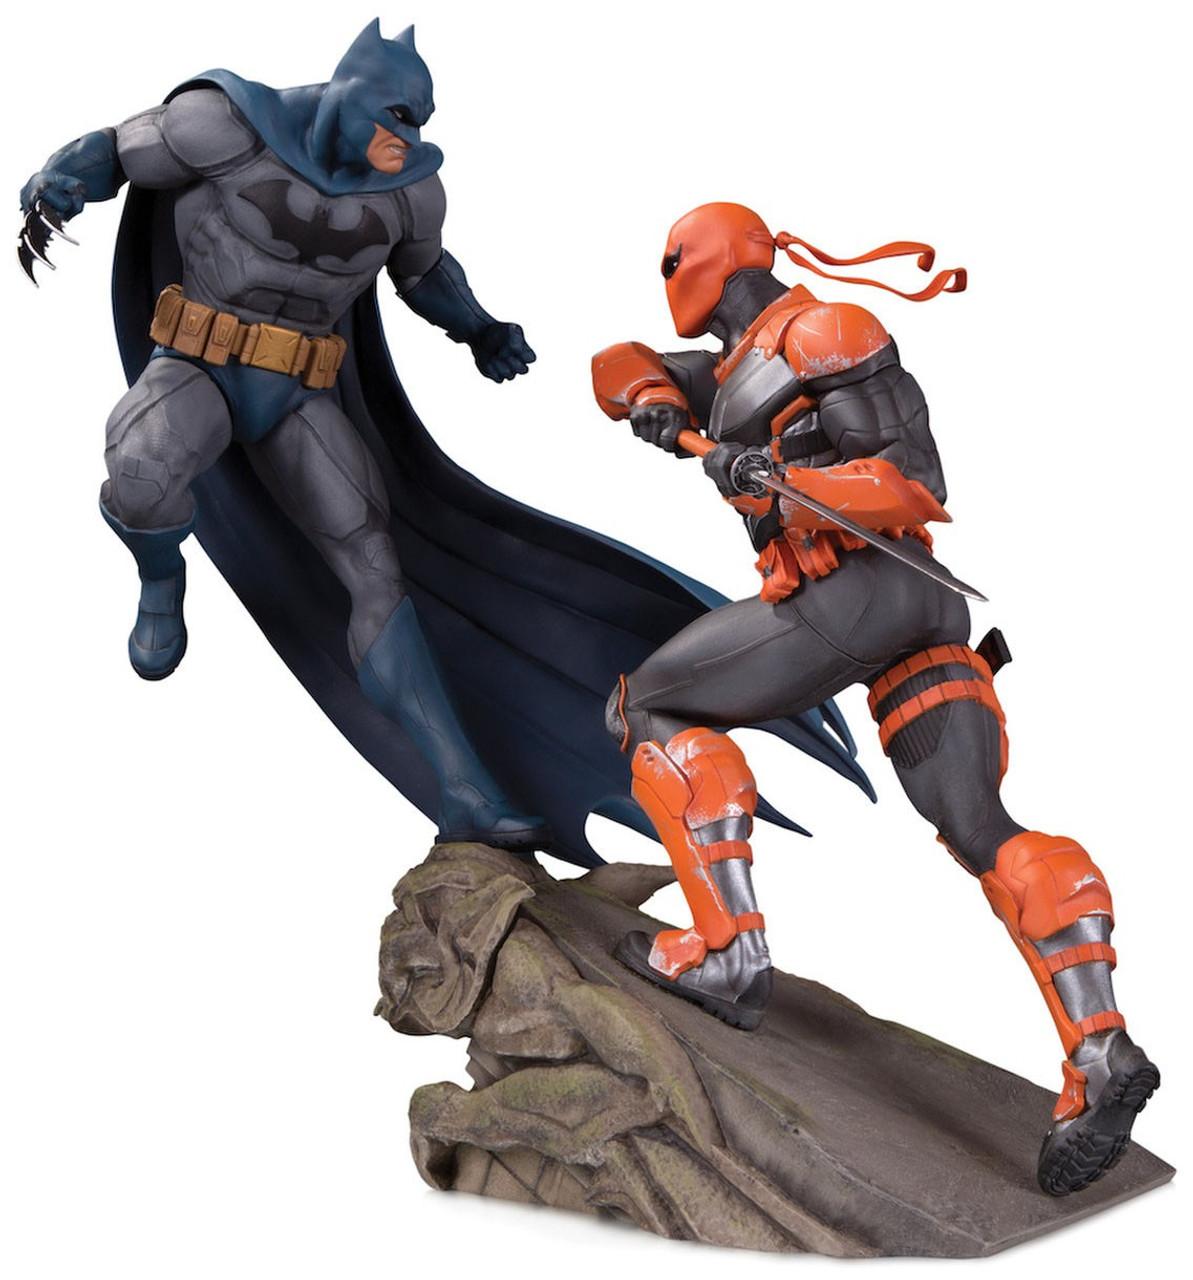 DC Batman Batman Vs. Deathstroke 11.2 Mini Battle Statue DC Collectibles - ToyWiz